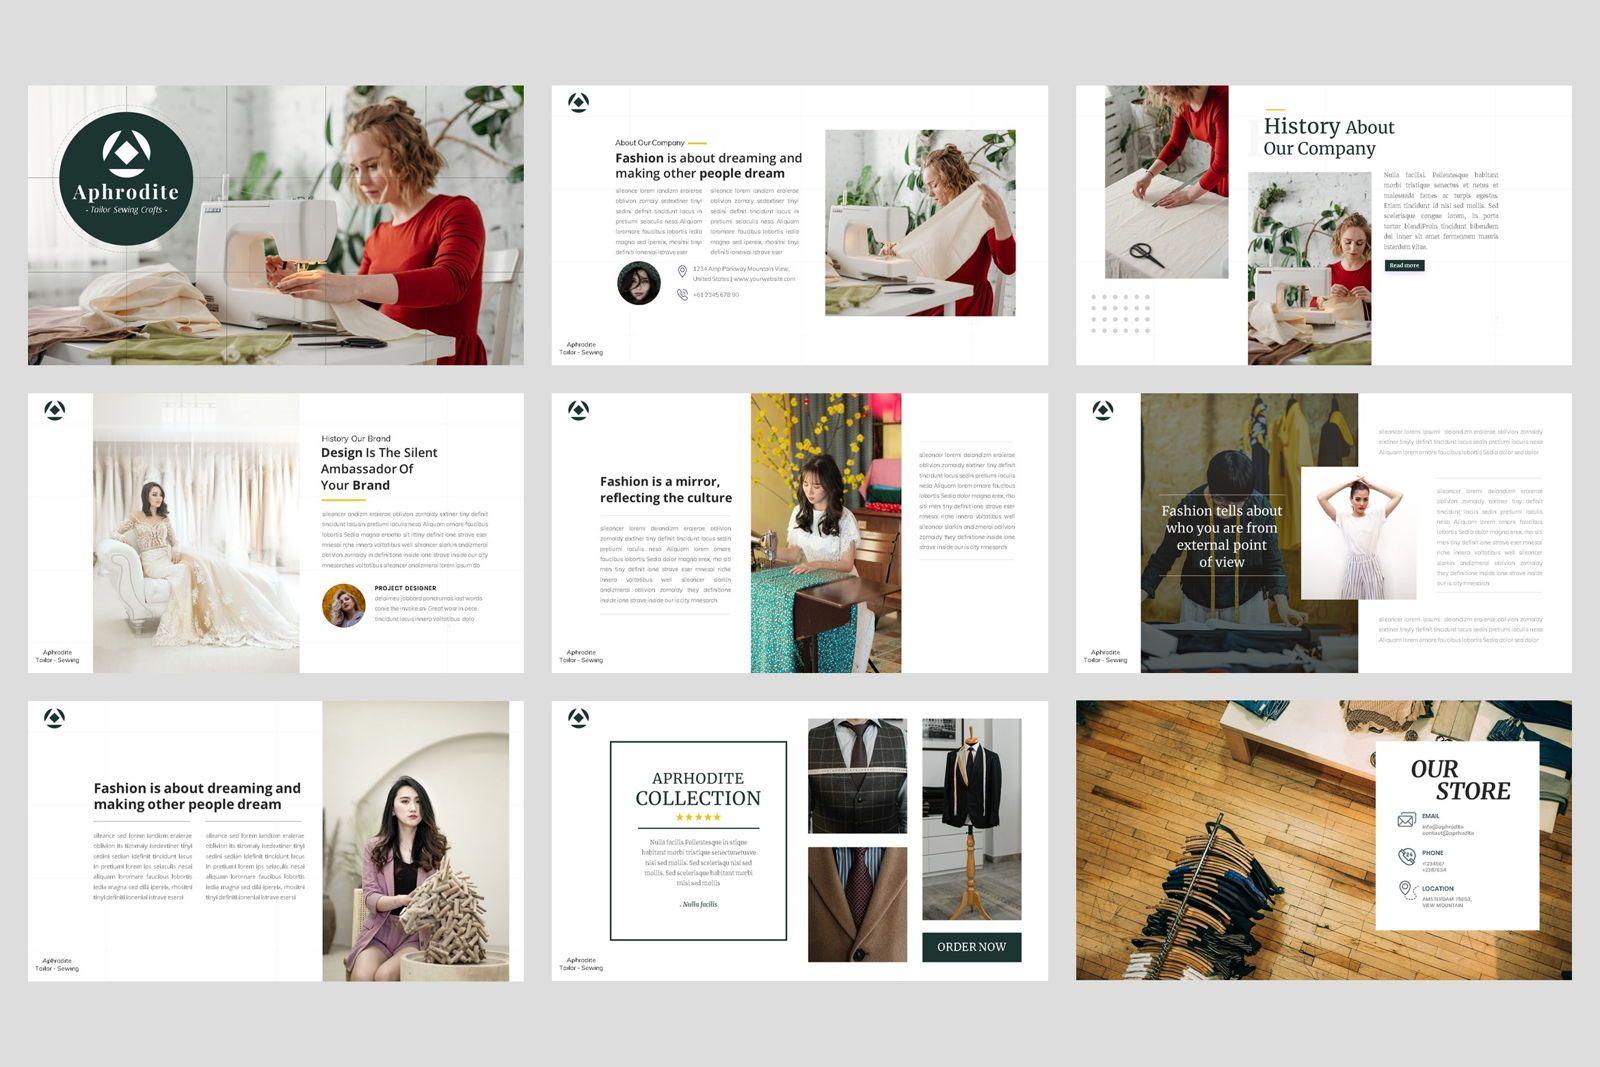 Tailor - Sewing Fashion Craft Google Slide Template, Slide 2, 08621, Business Models — PoweredTemplate.com